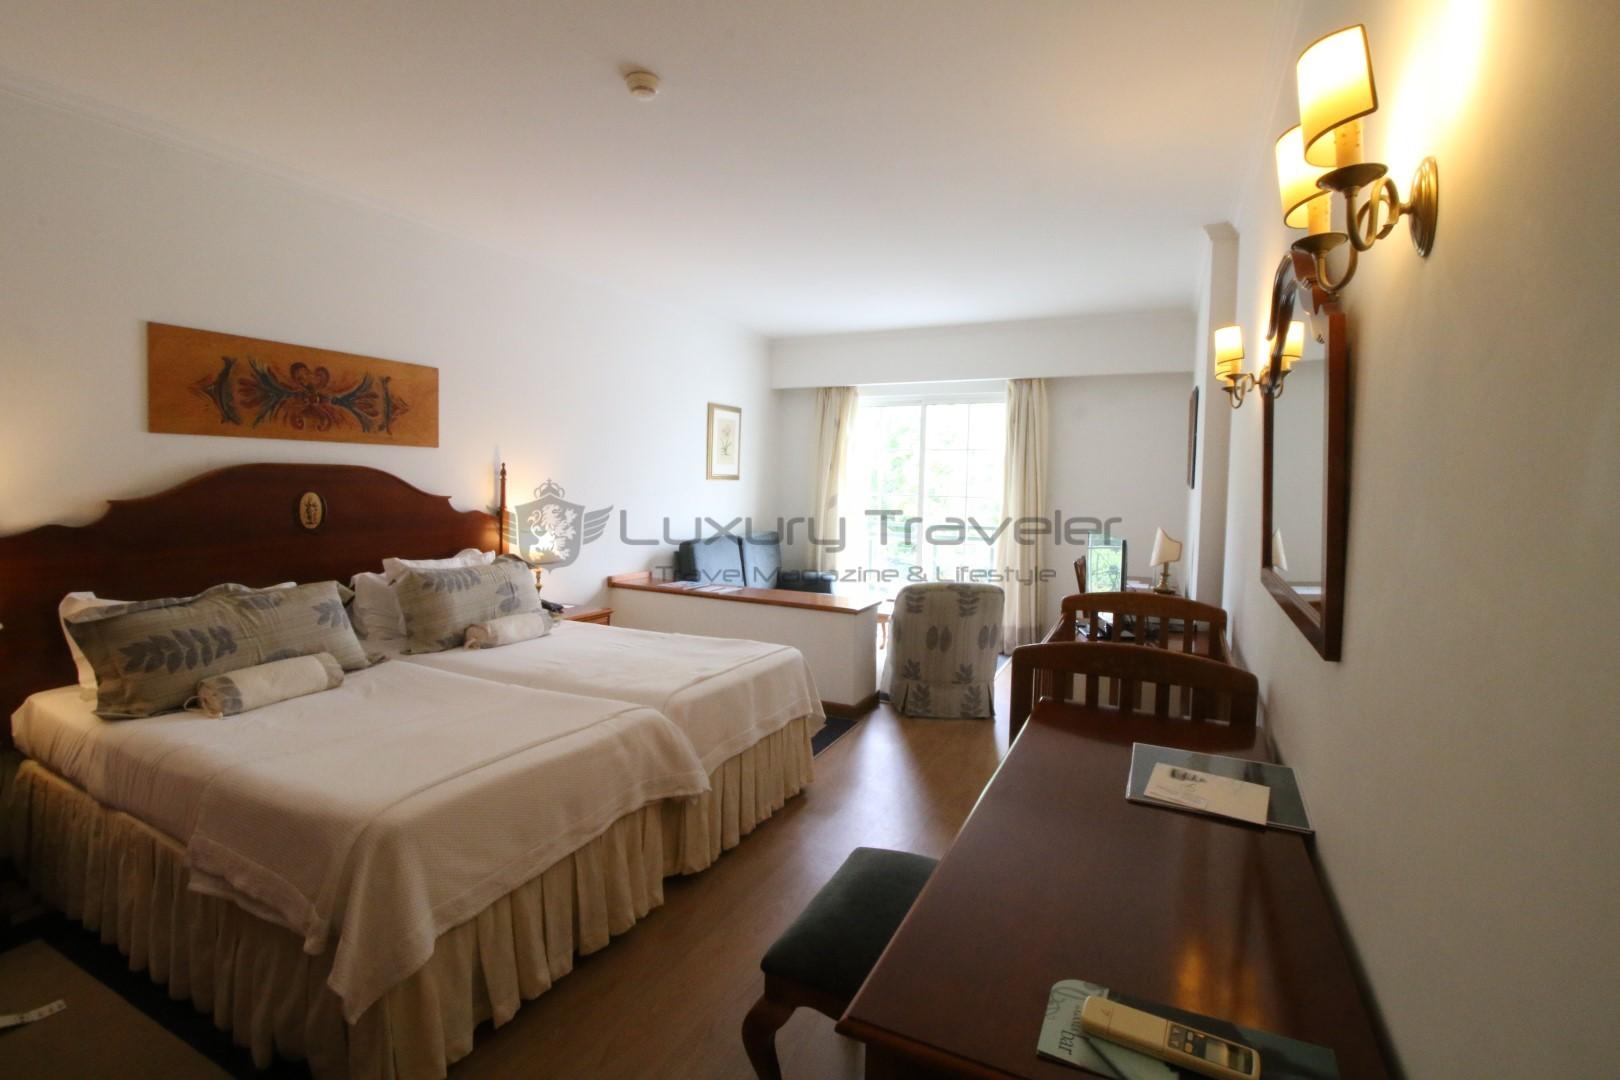 quintinha_sao_joao_funchal_madeira_hotel_booking